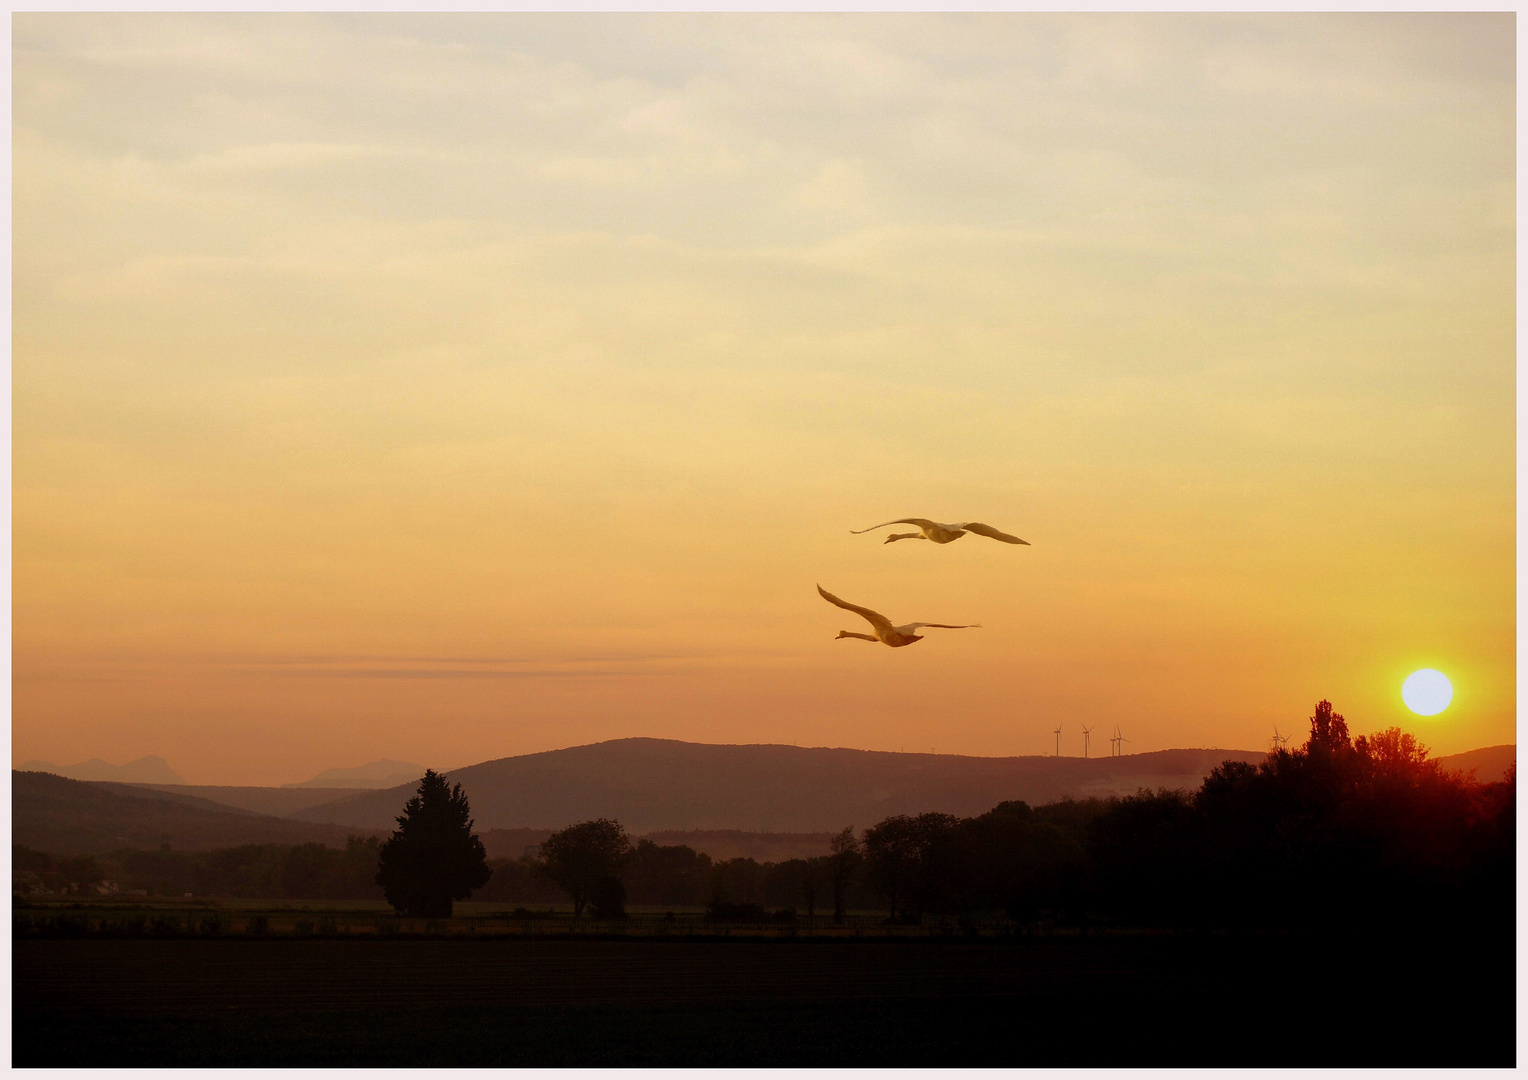 Flug in den Morgen  -   Vol au soleil levant